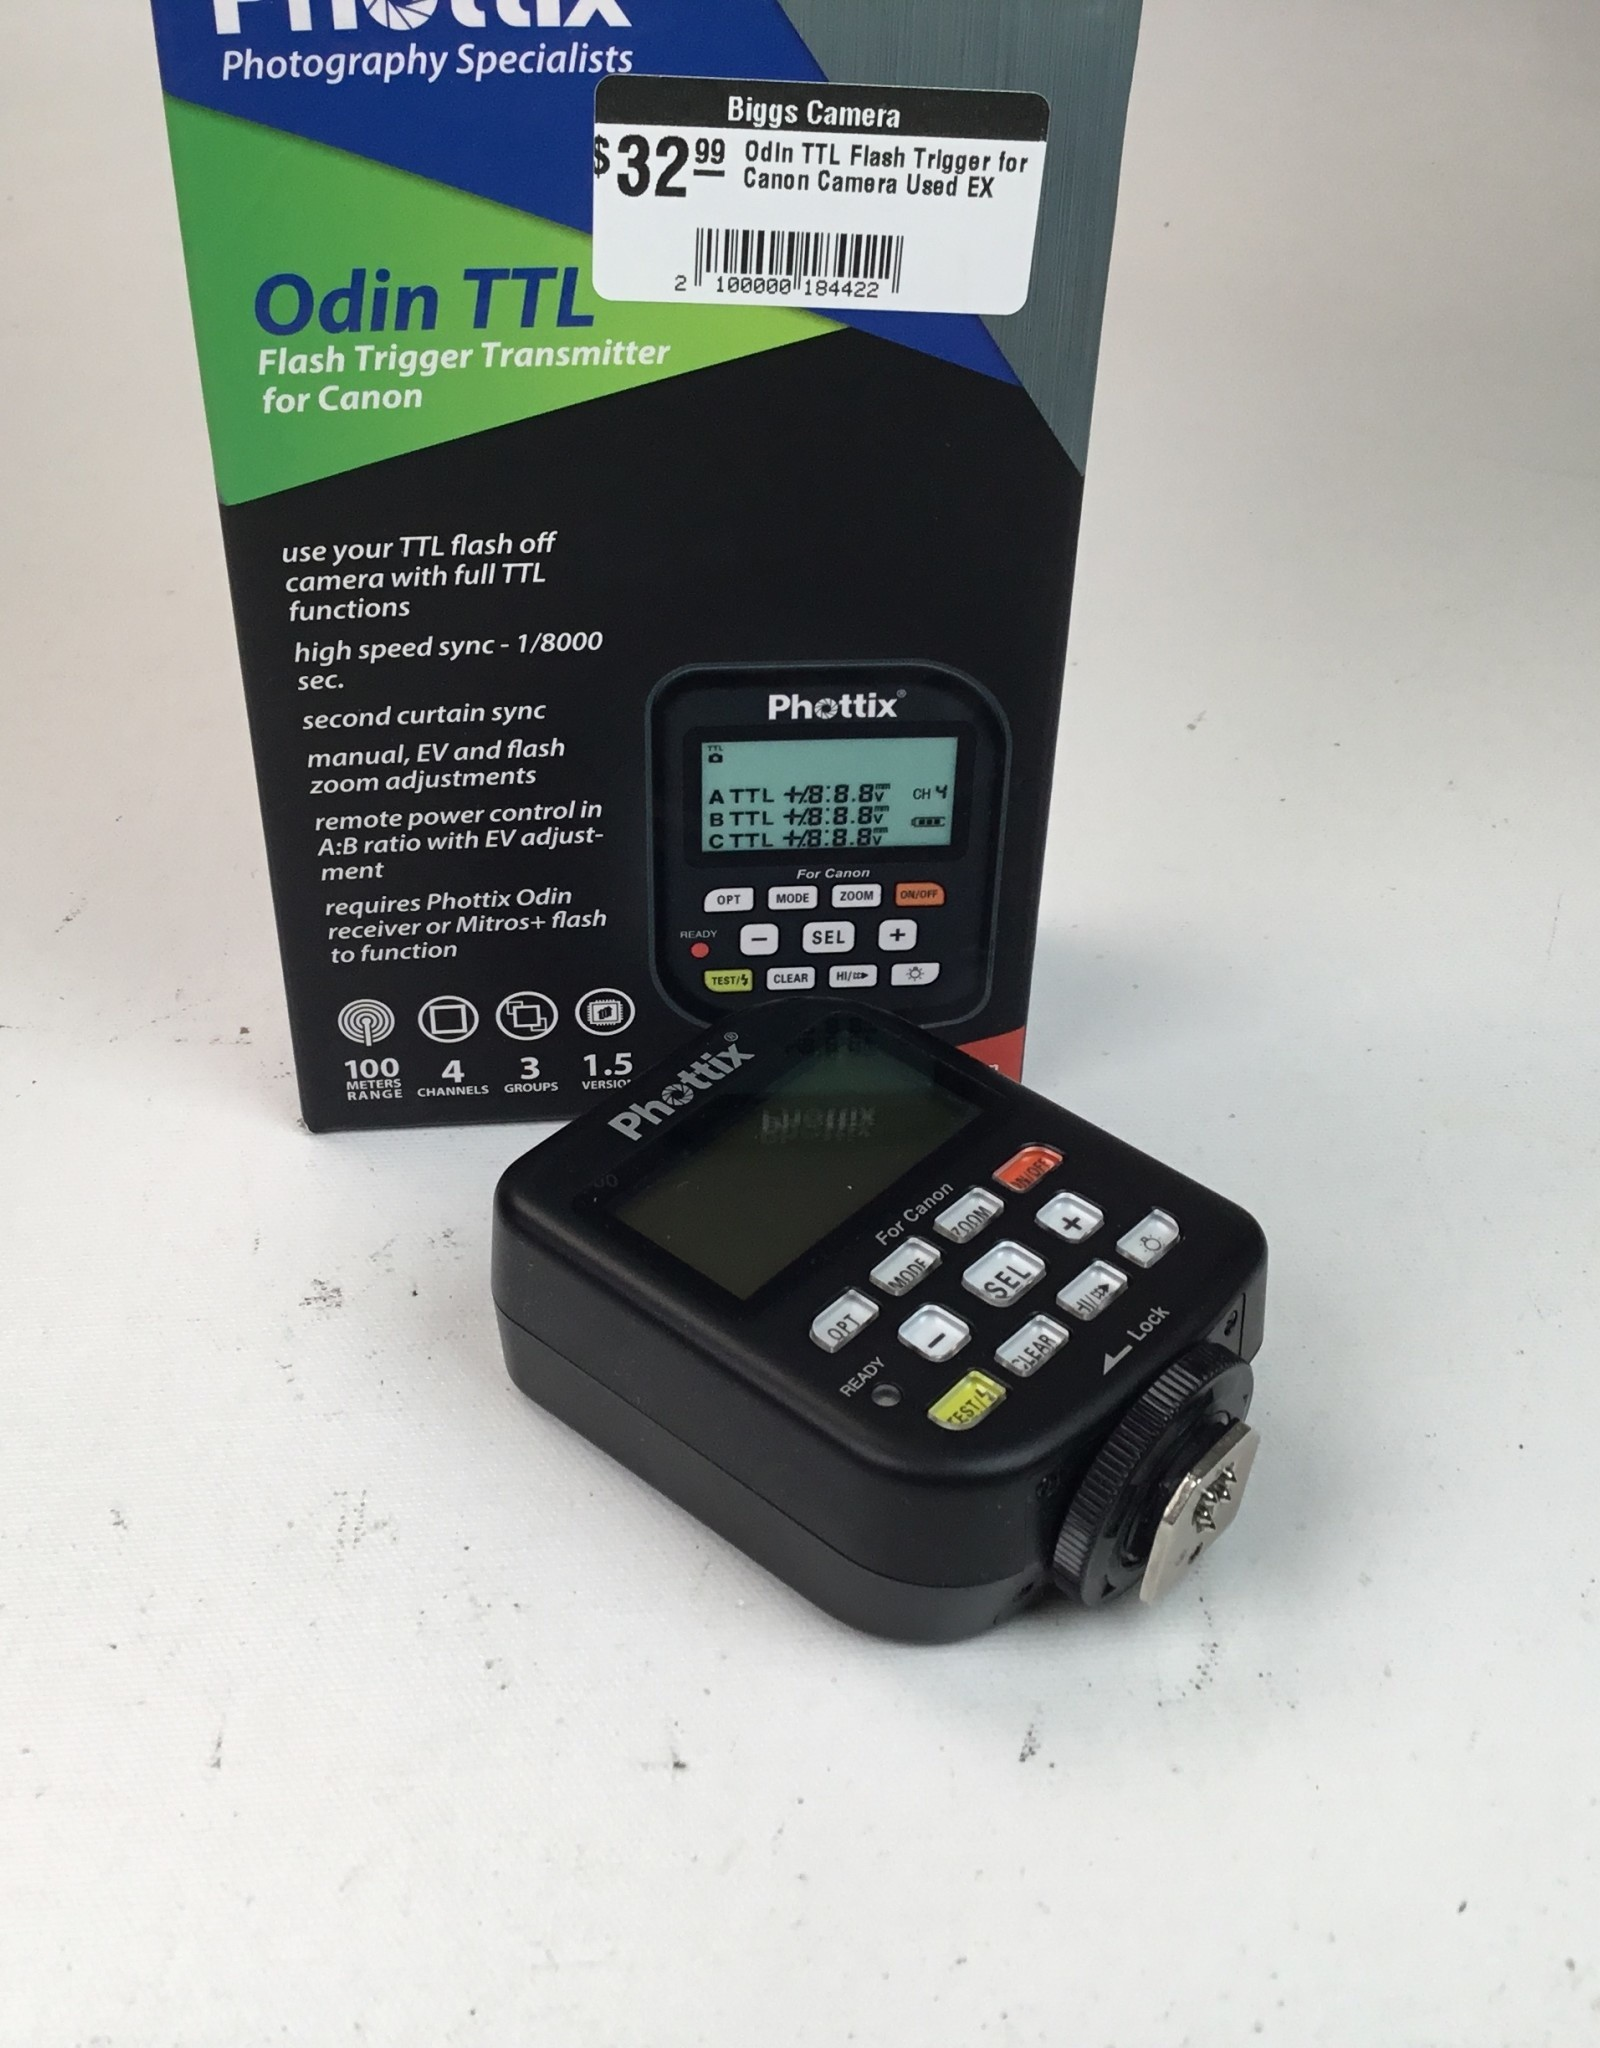 PHOTTIX Odin TTL Flash Trigger for Canon Camera Used EX